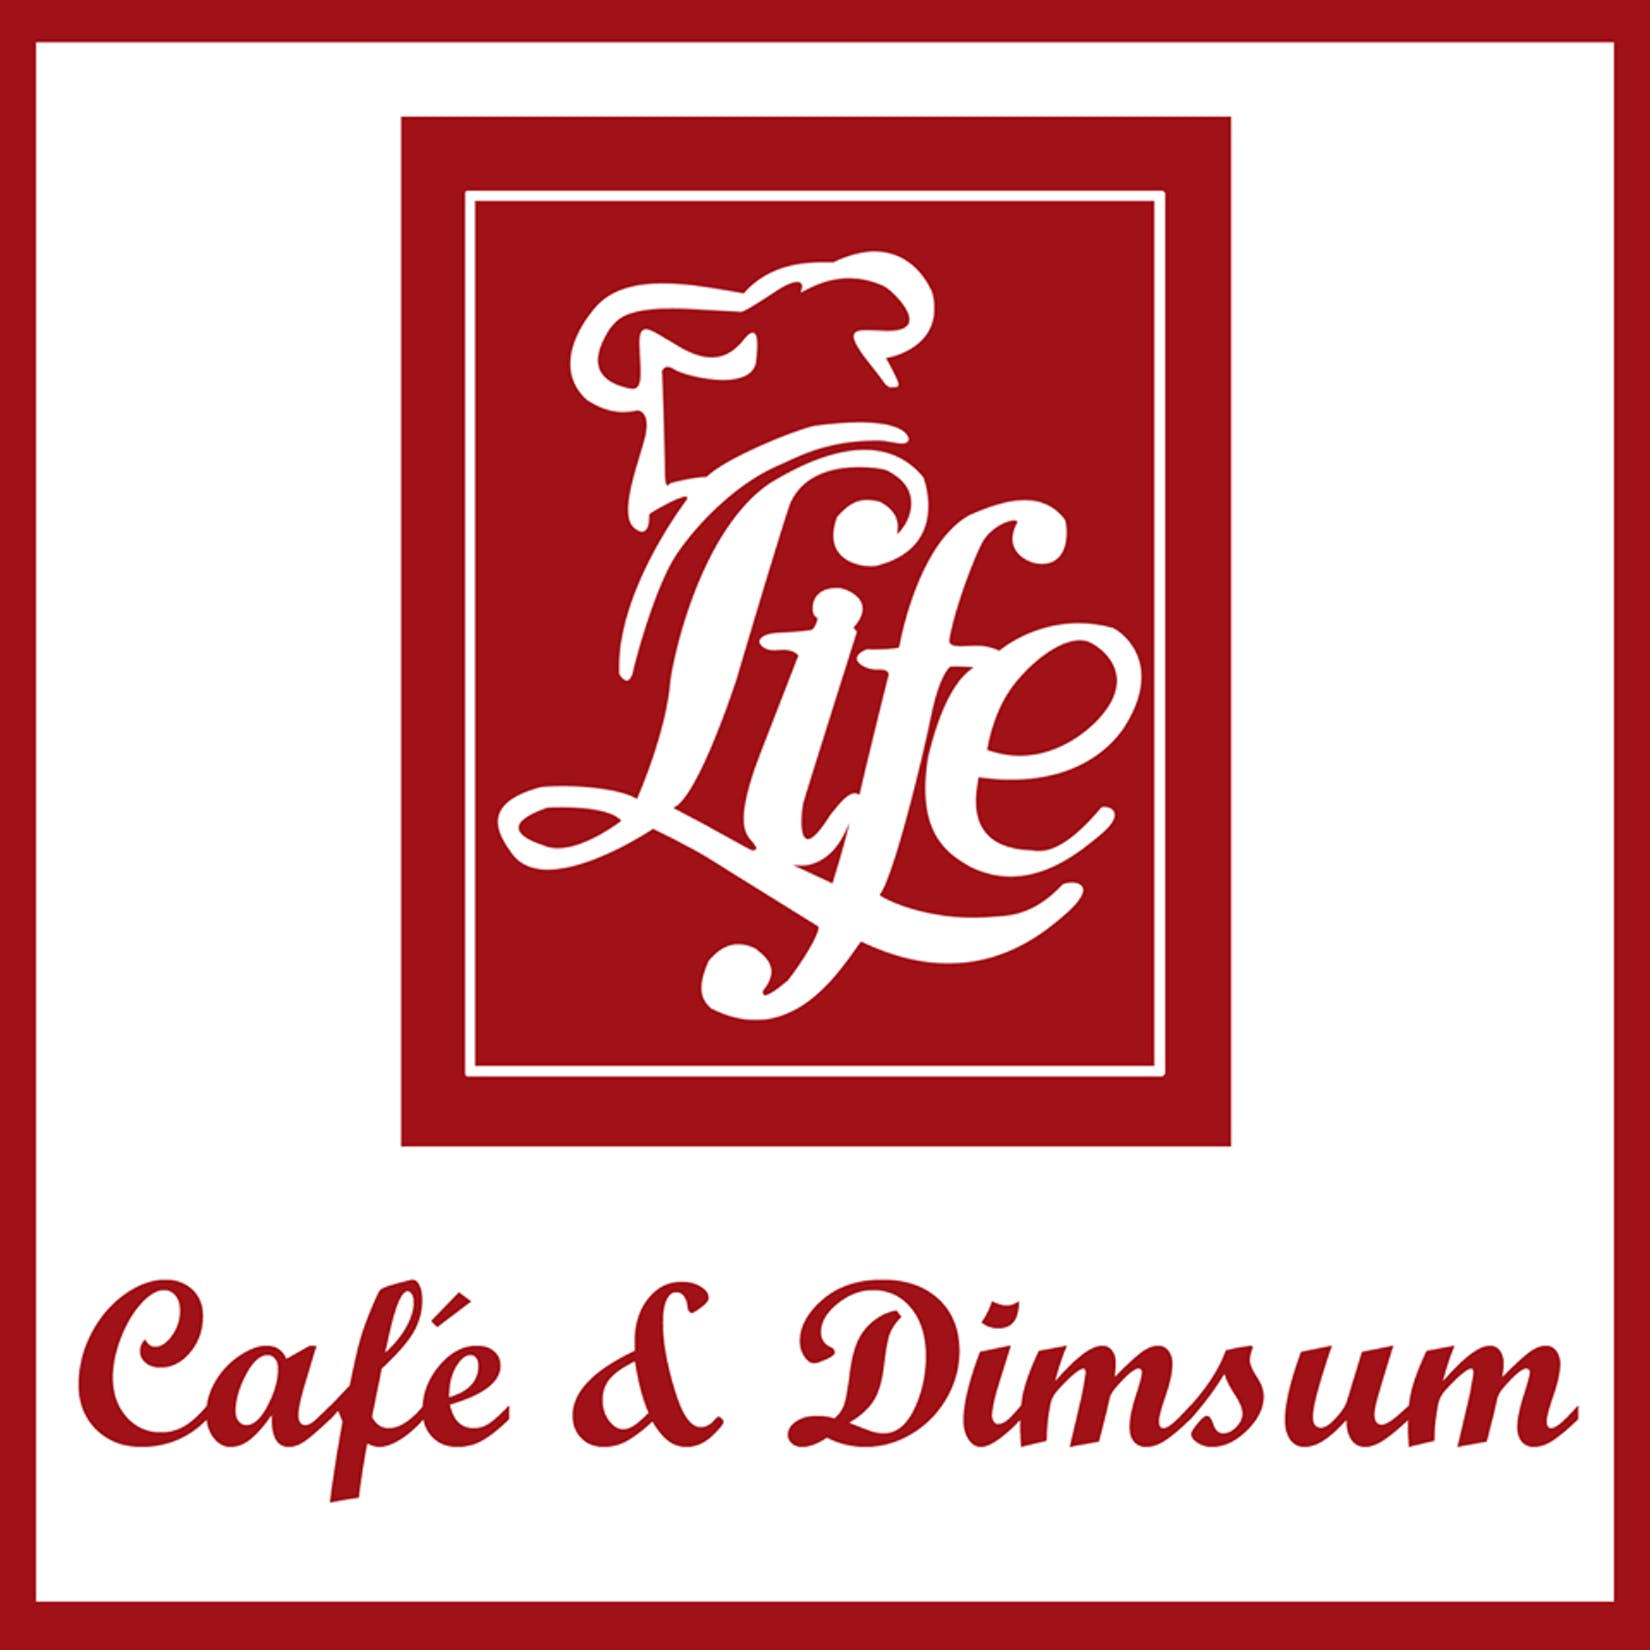 Life Cafe Mdy | yathar